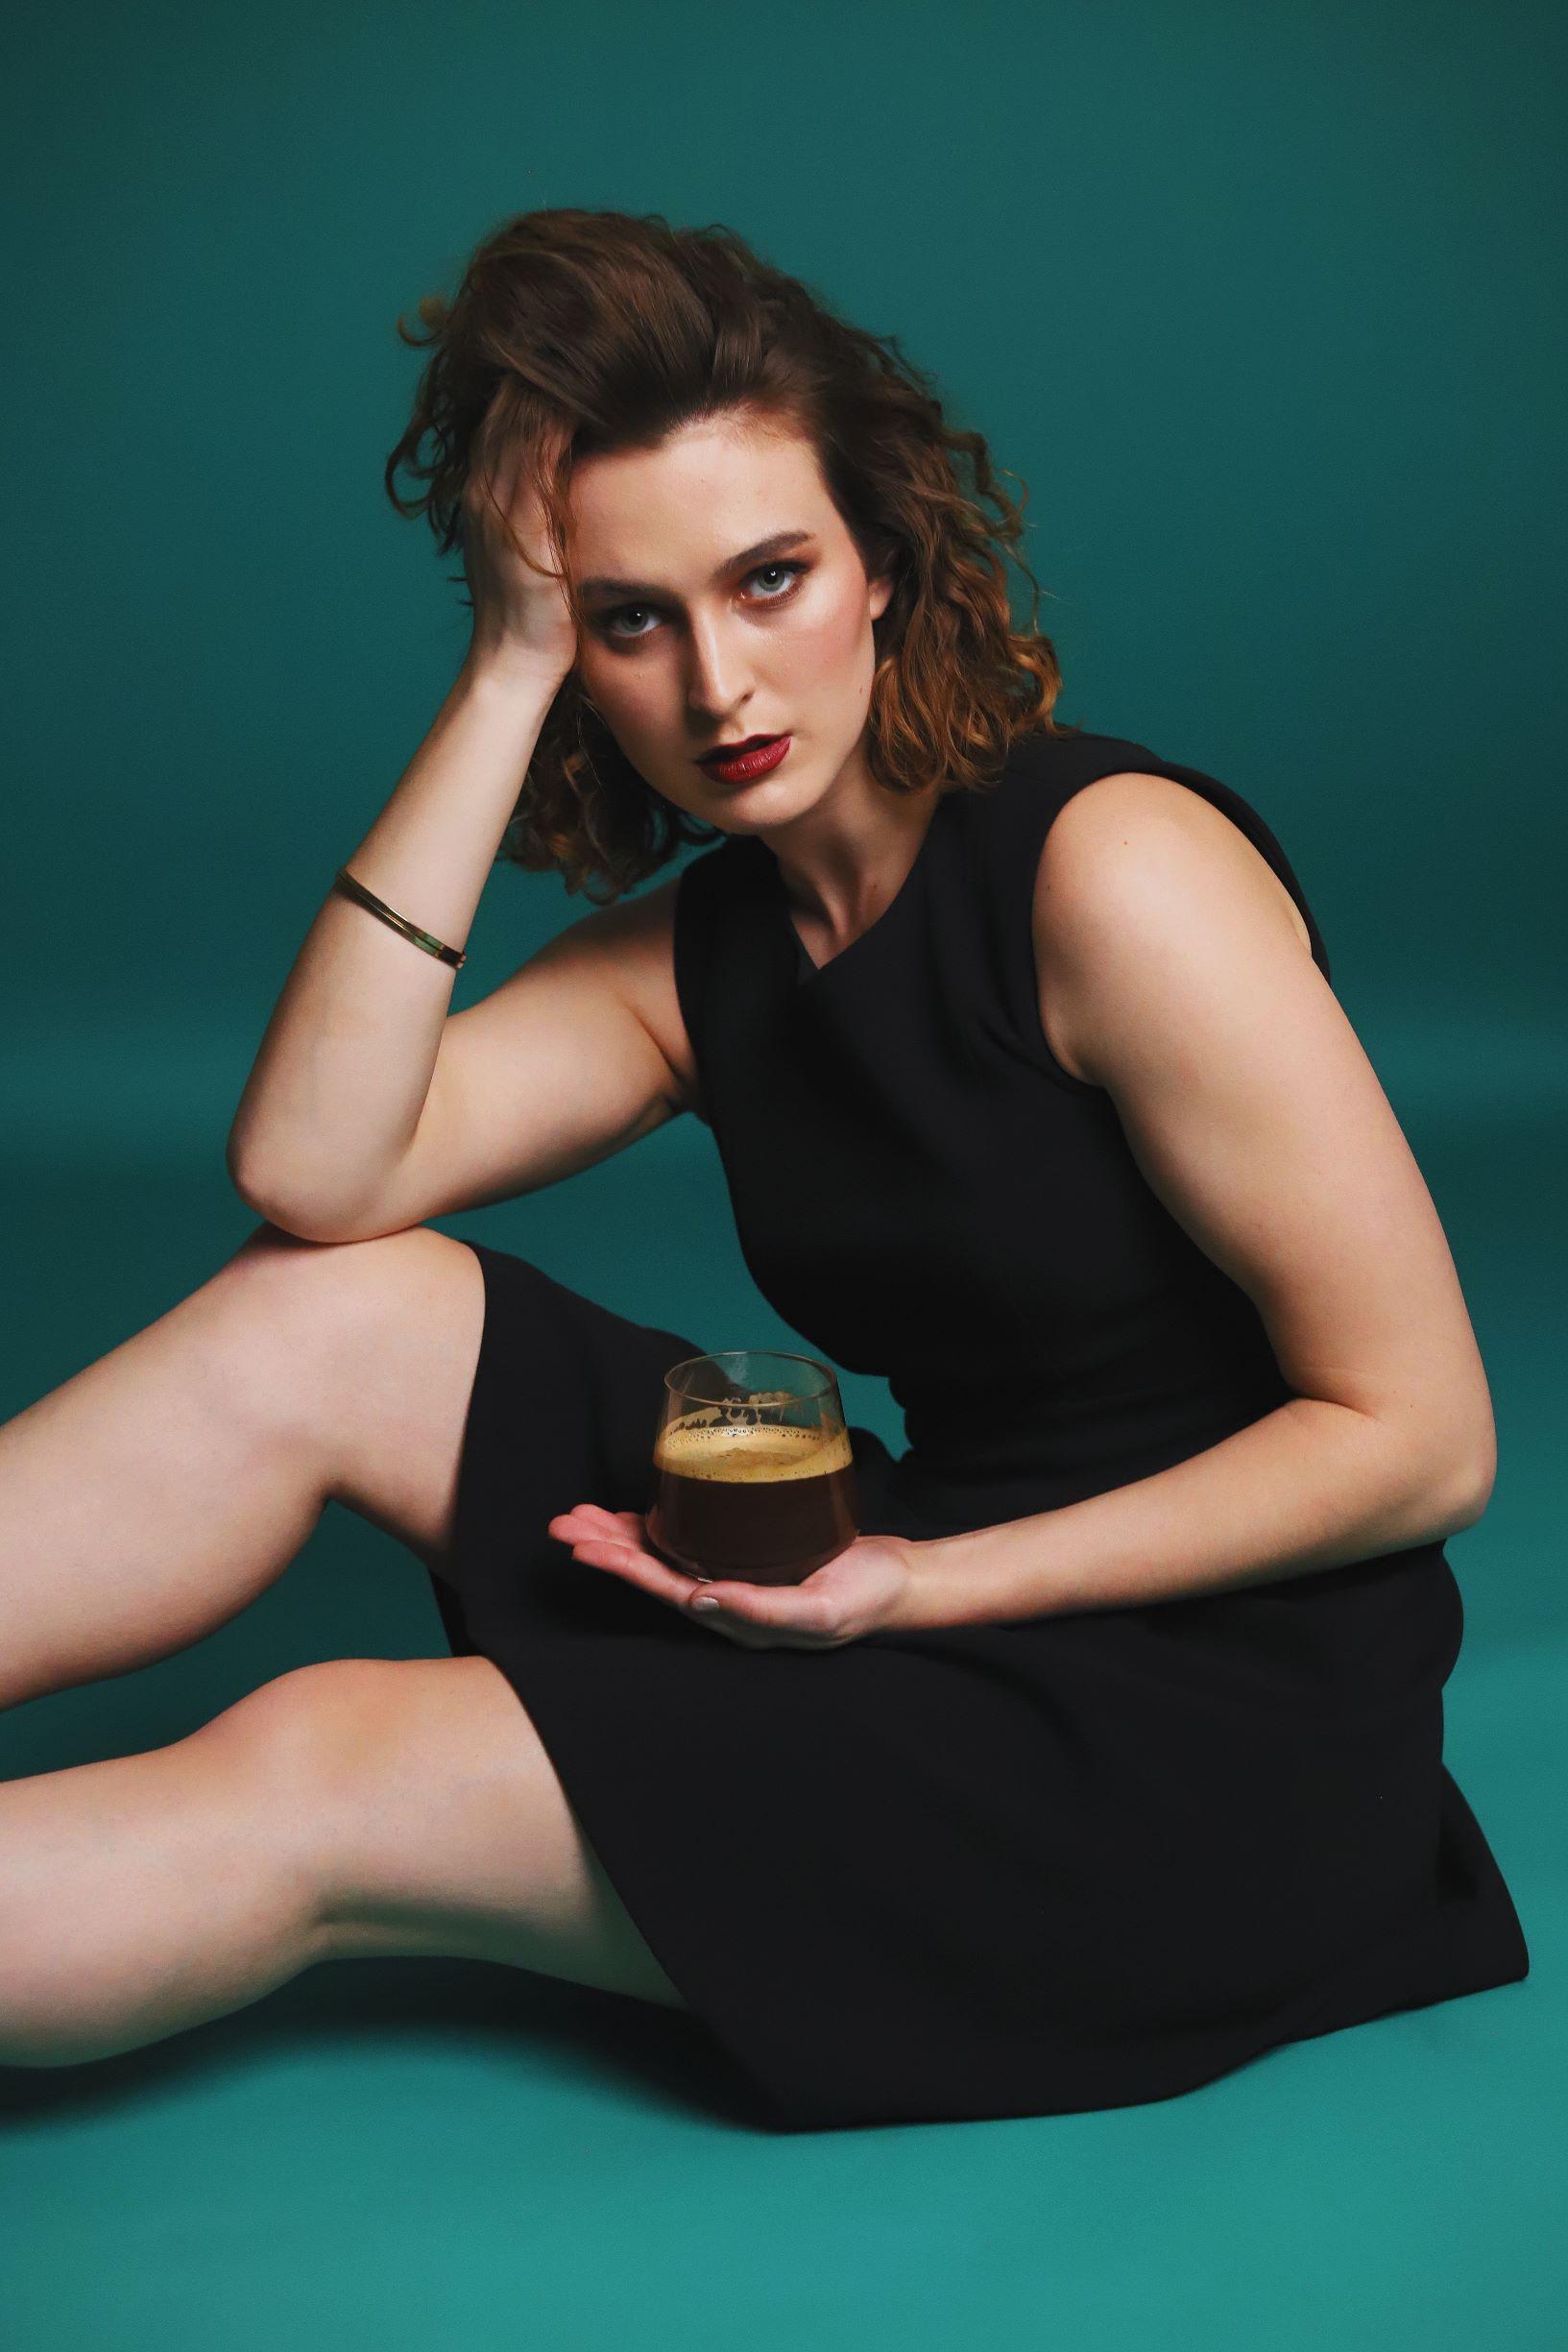 LeClair Organics Coffee Saskatoon, Coffee Roaster Saskatoon commercial photography with Jenna Rozlin 10